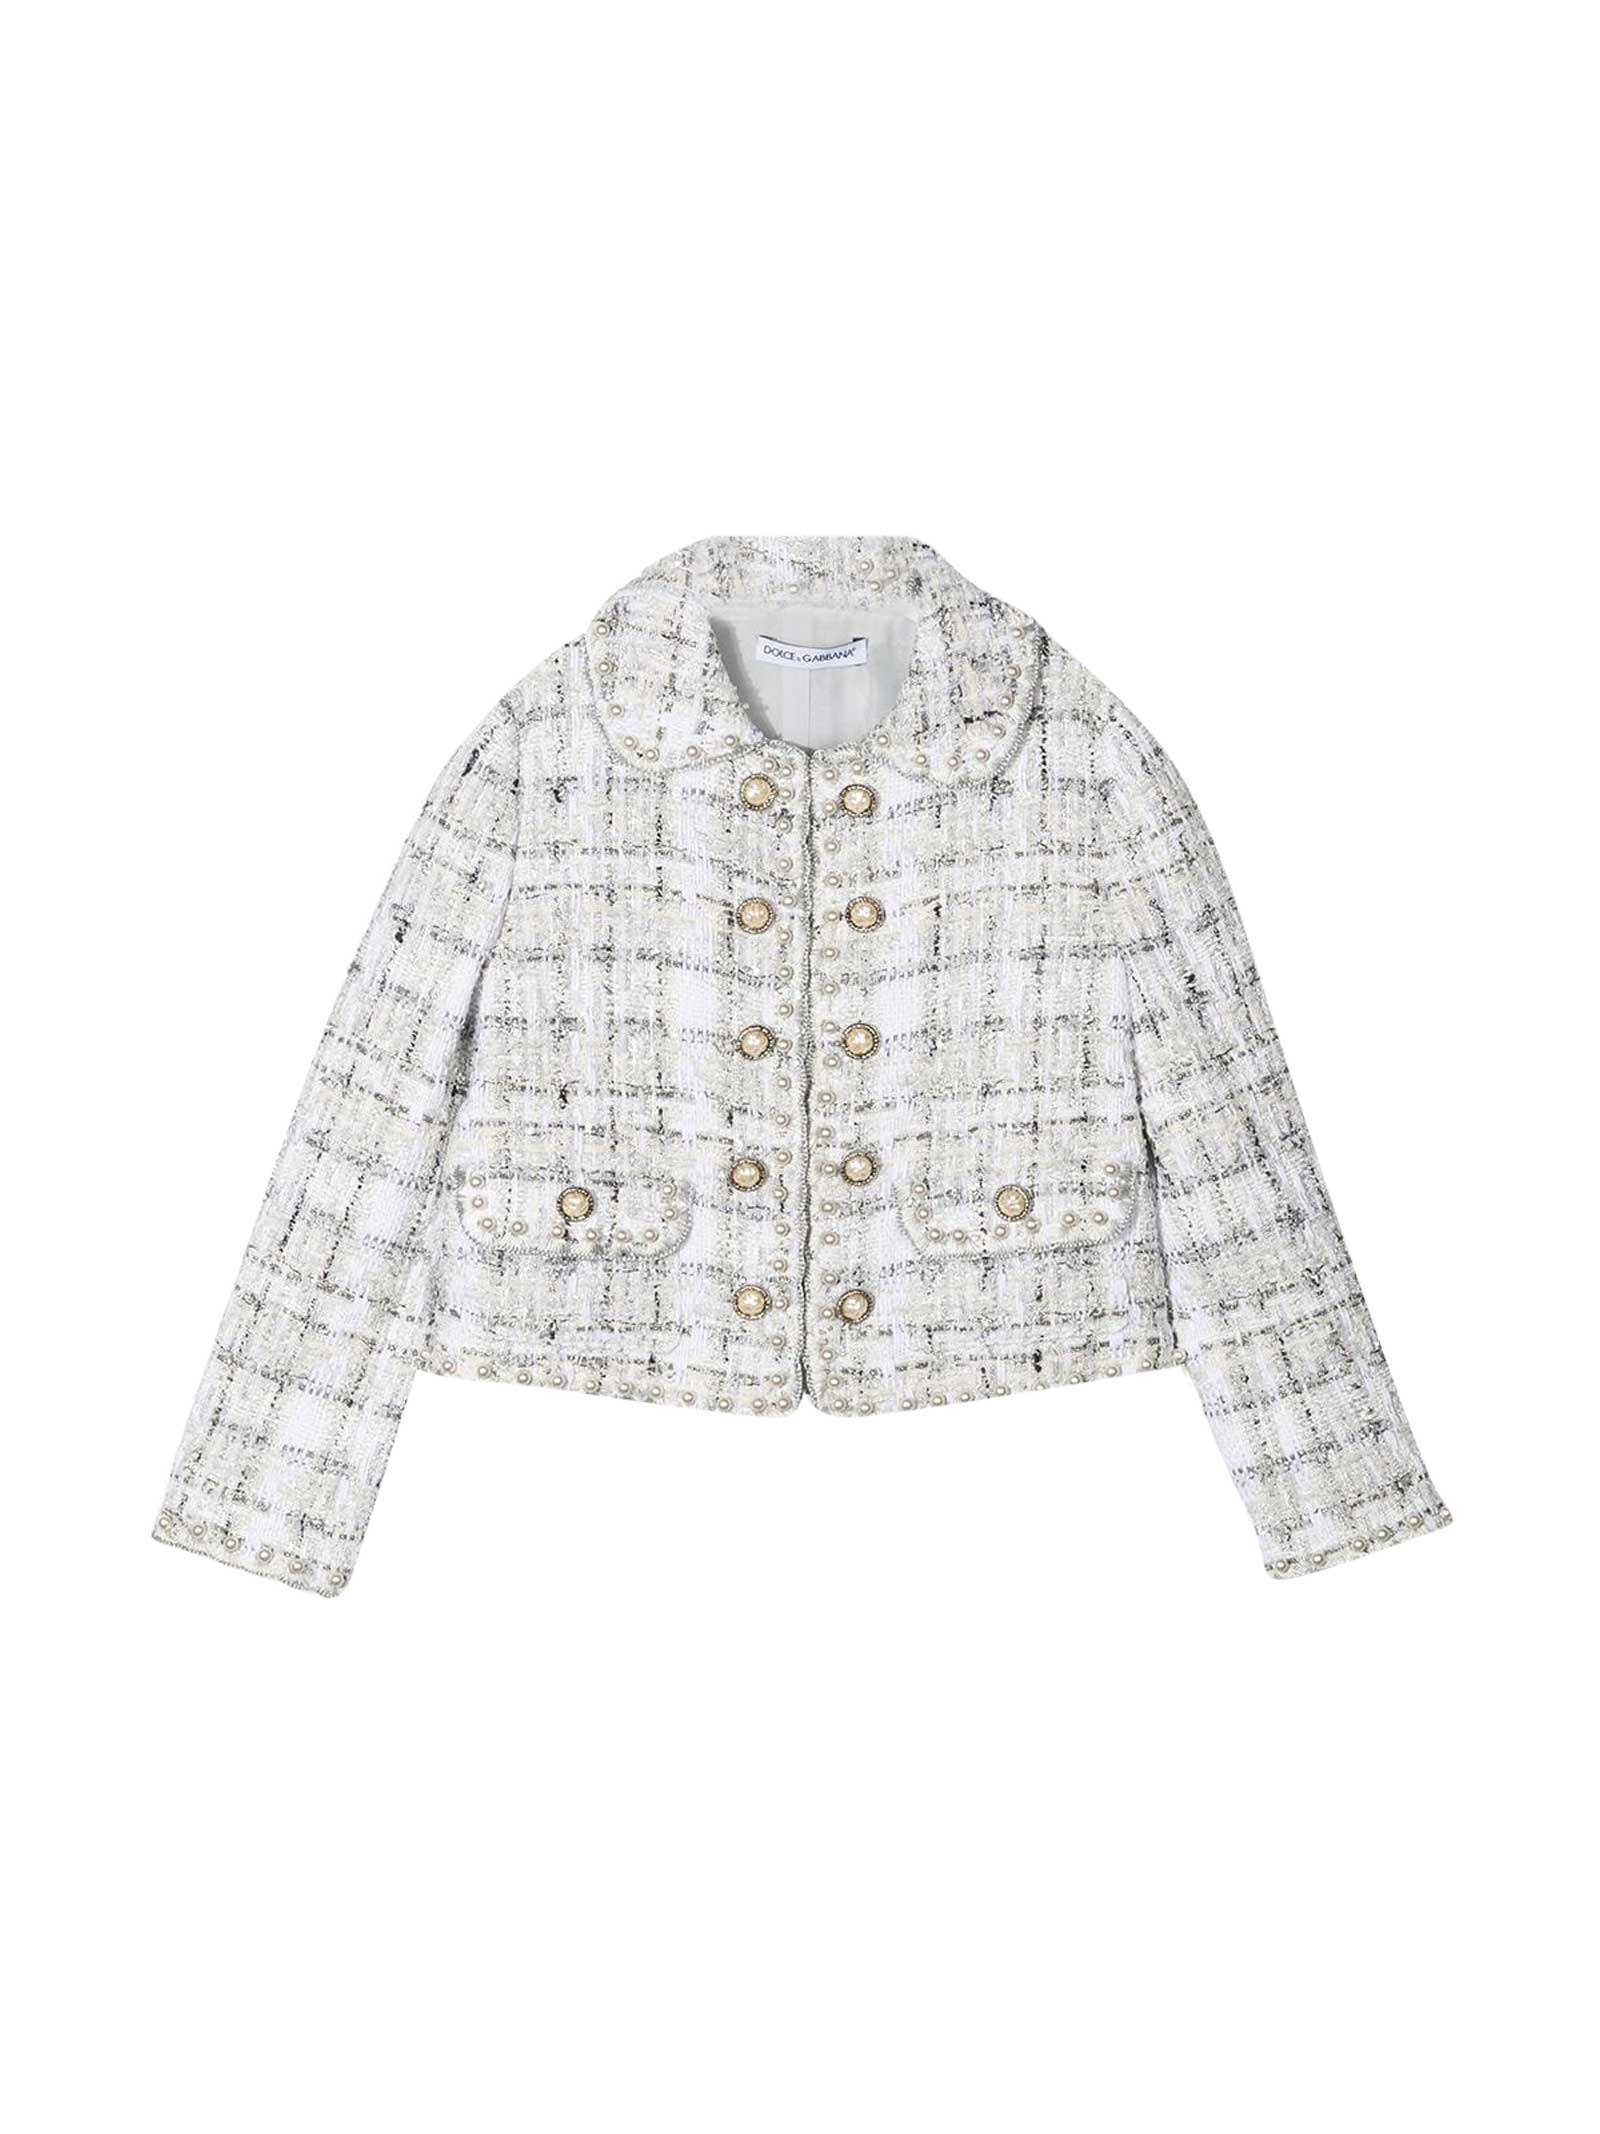 Dolce & Gabbana WHITE TWEED JACKET